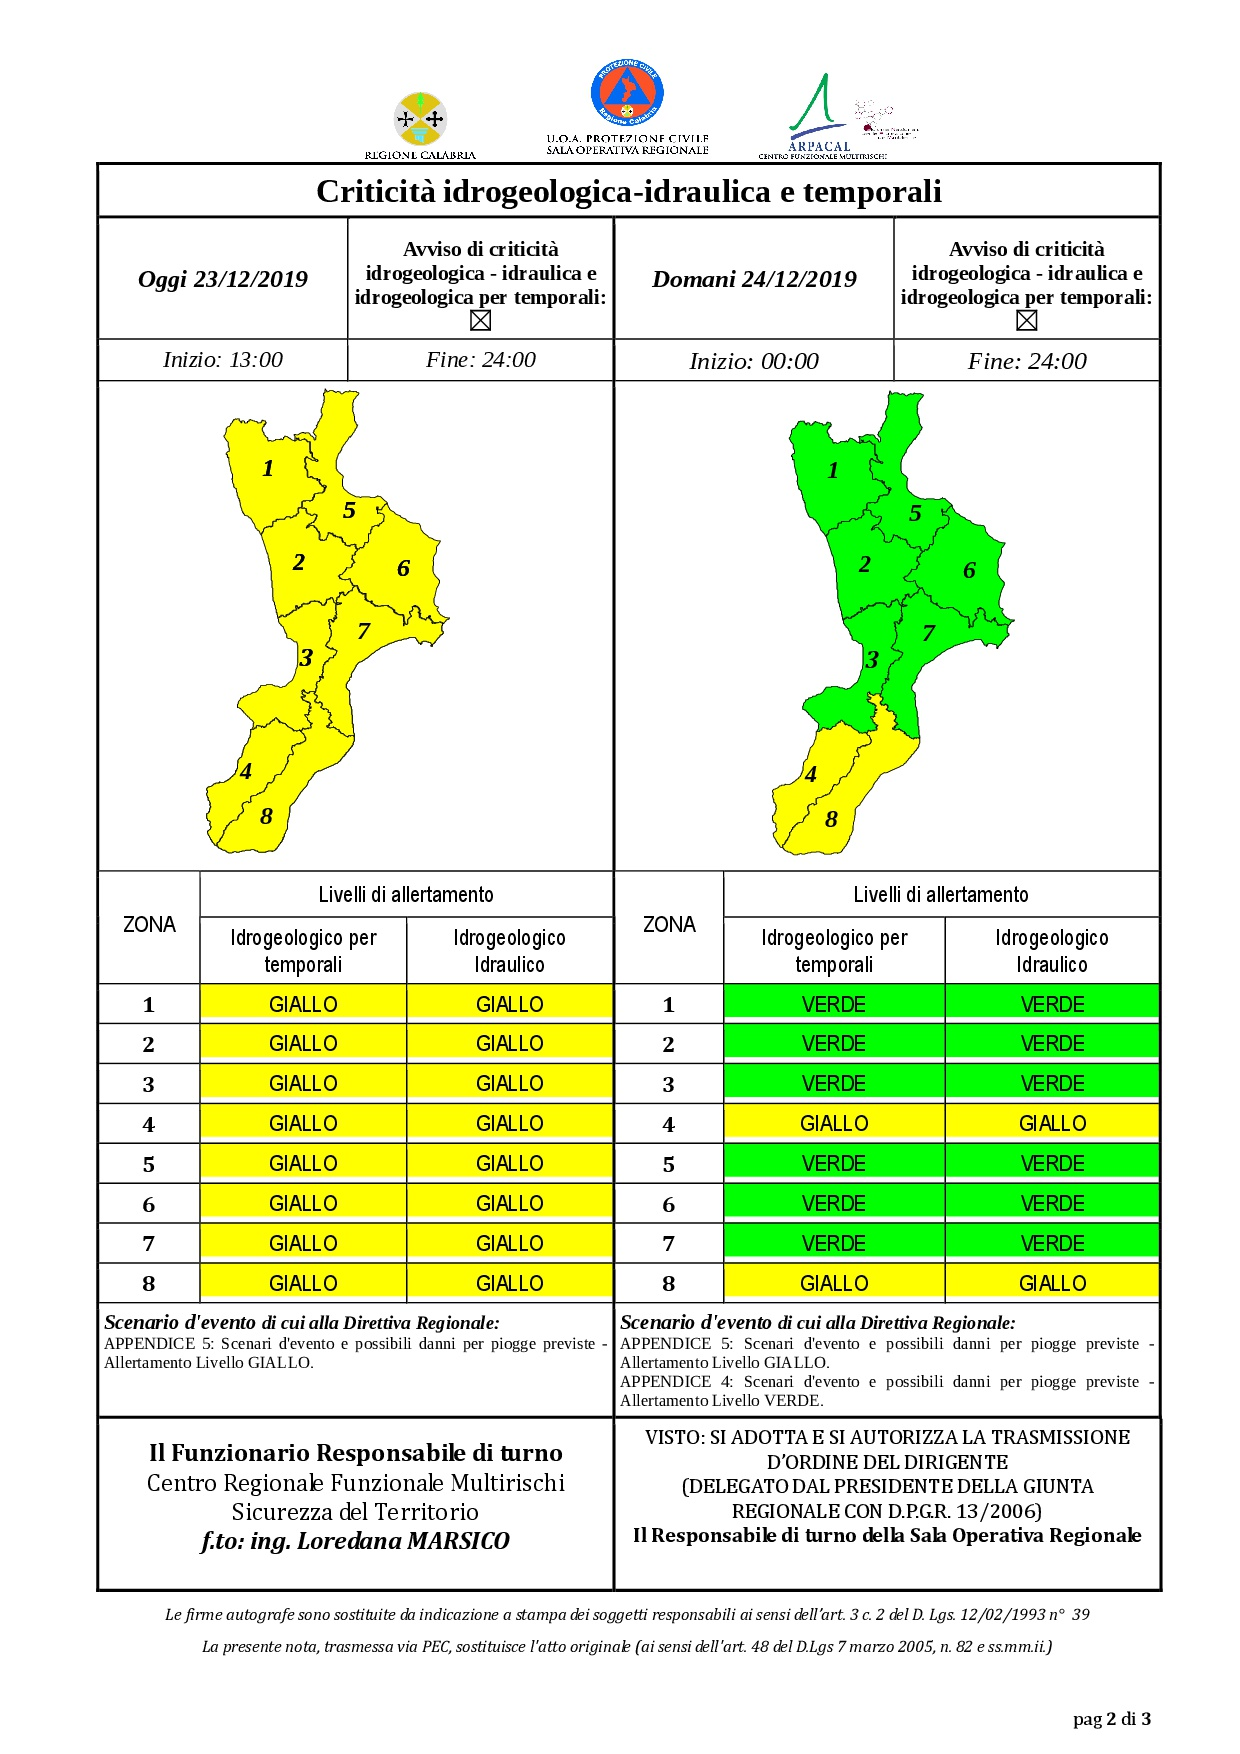 Criticità idrogeologica-idraulica e temporali in Calabria 23-12-2019